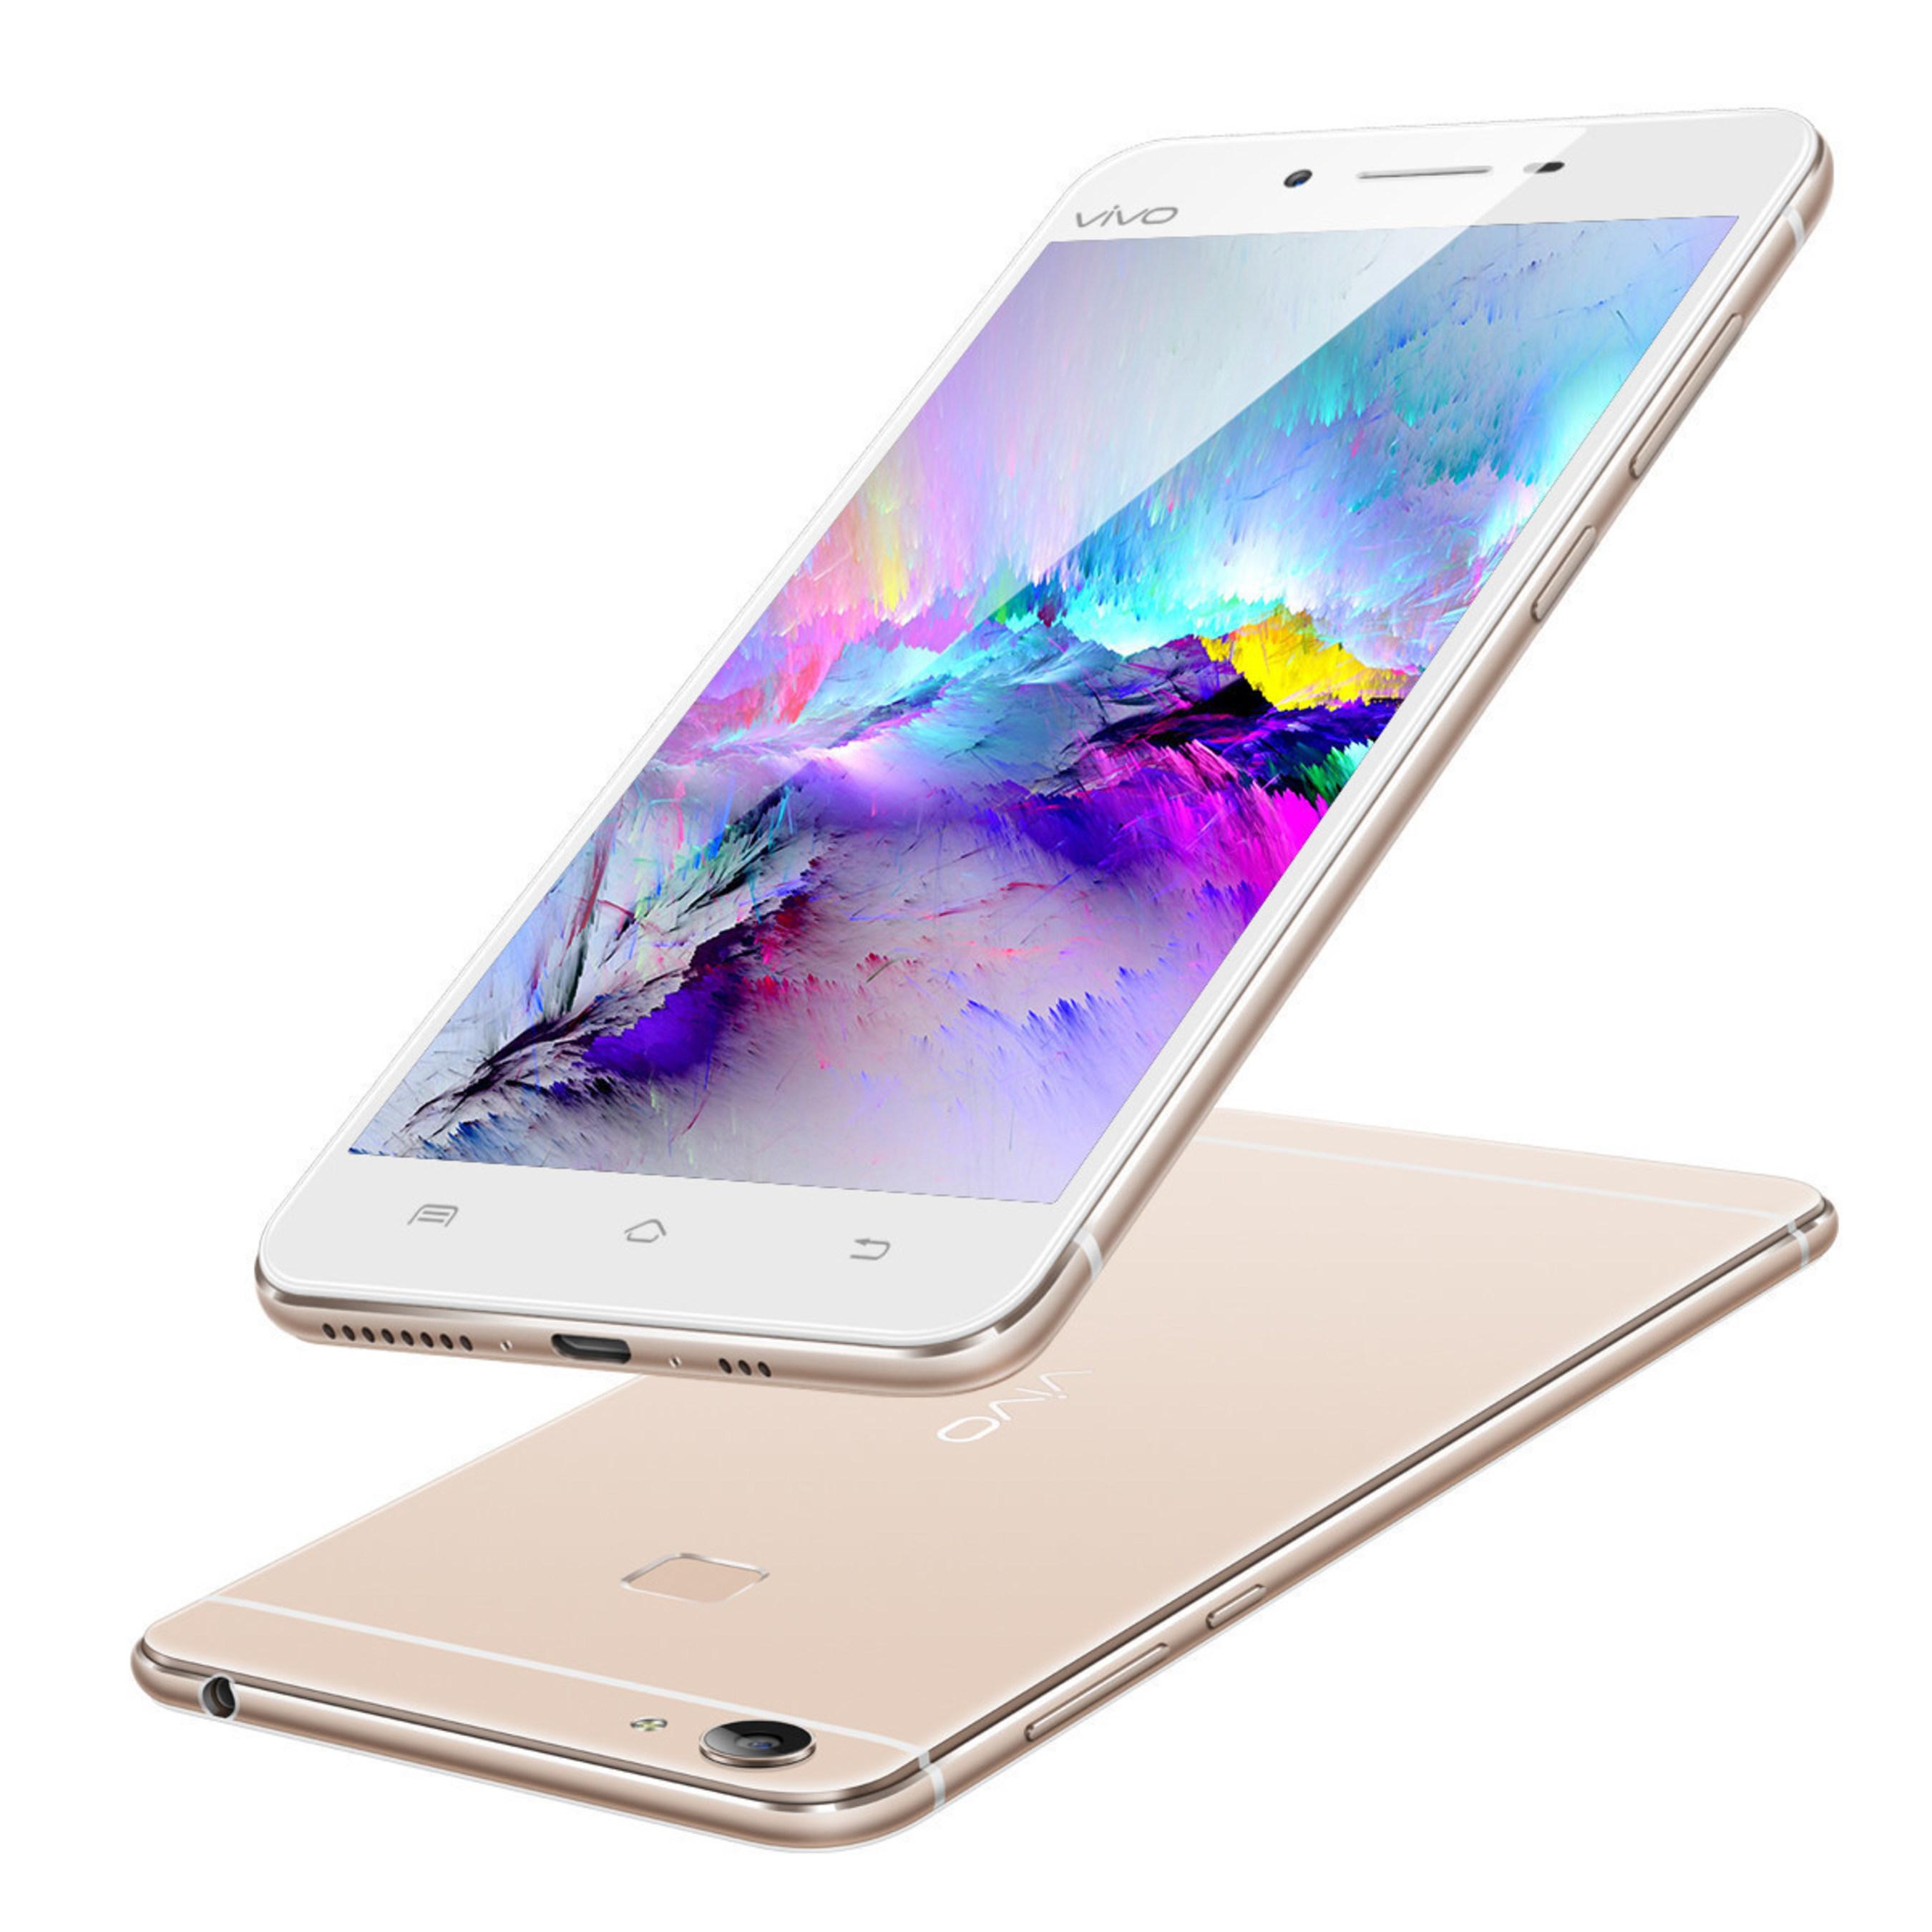 Vivo's new new flagship smartphone X6